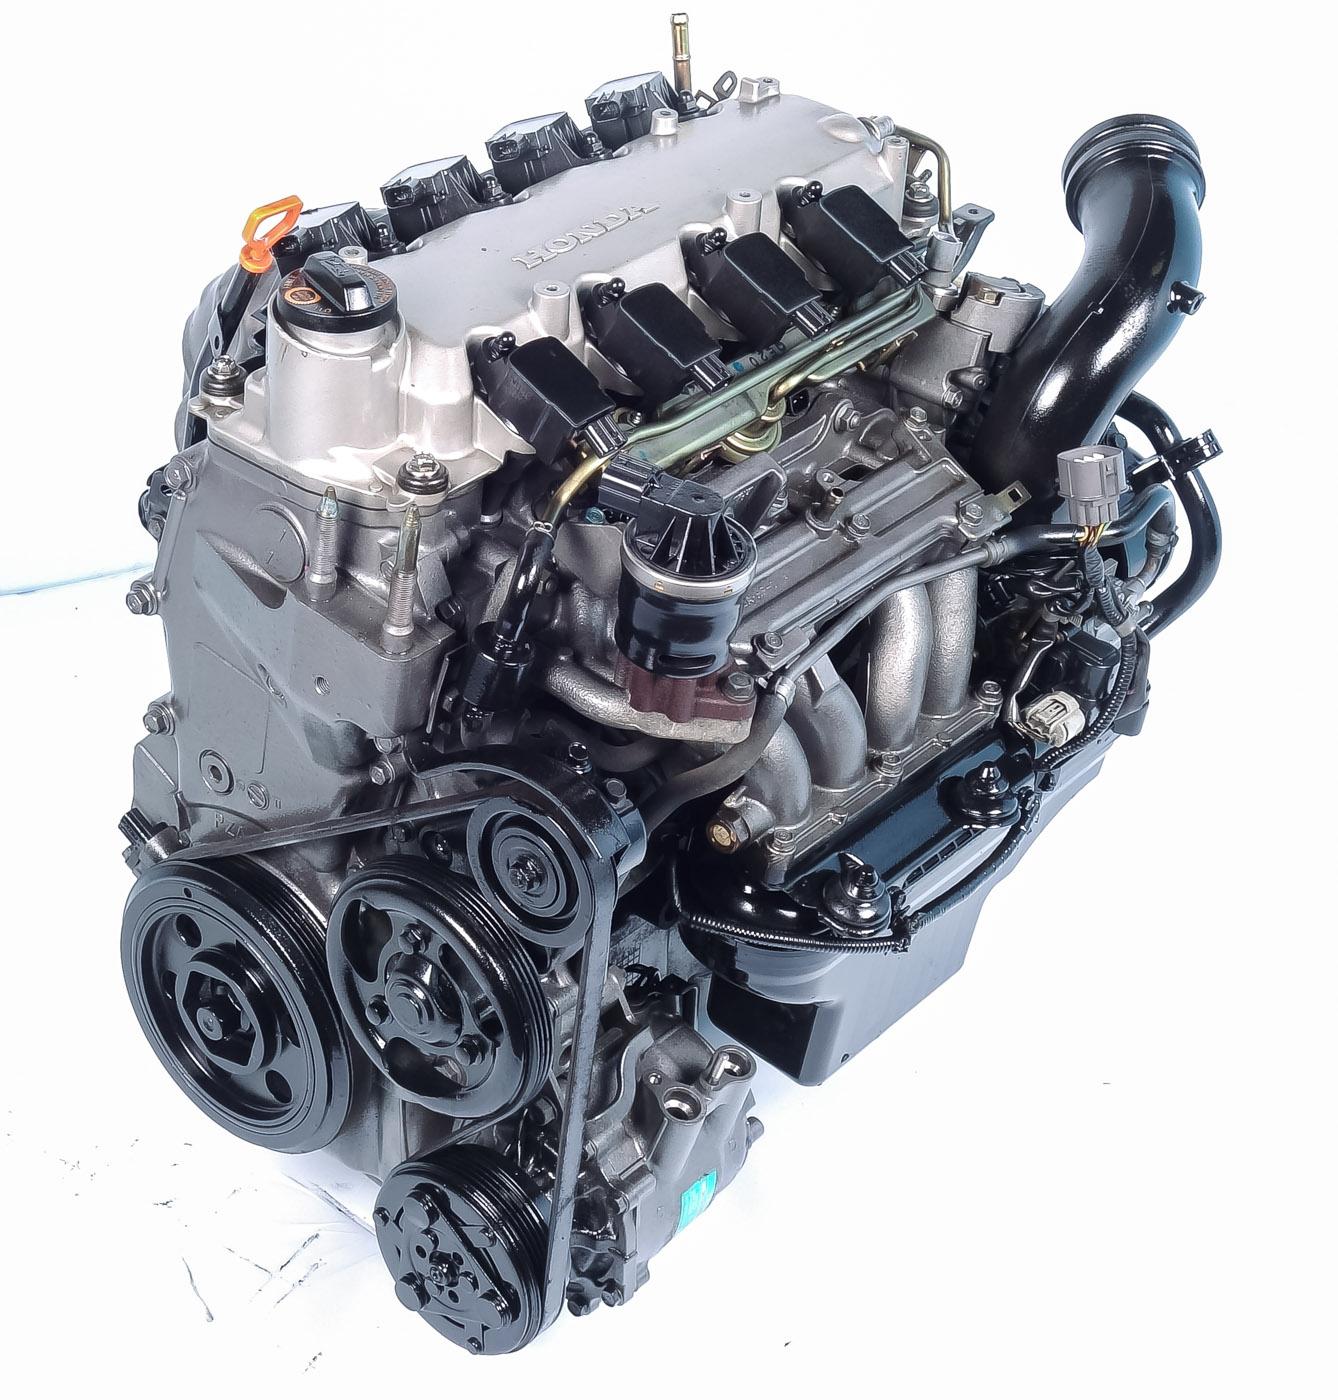 2003-2005 Honda Civic Hybrid 1.3L Used Engine   Engine World